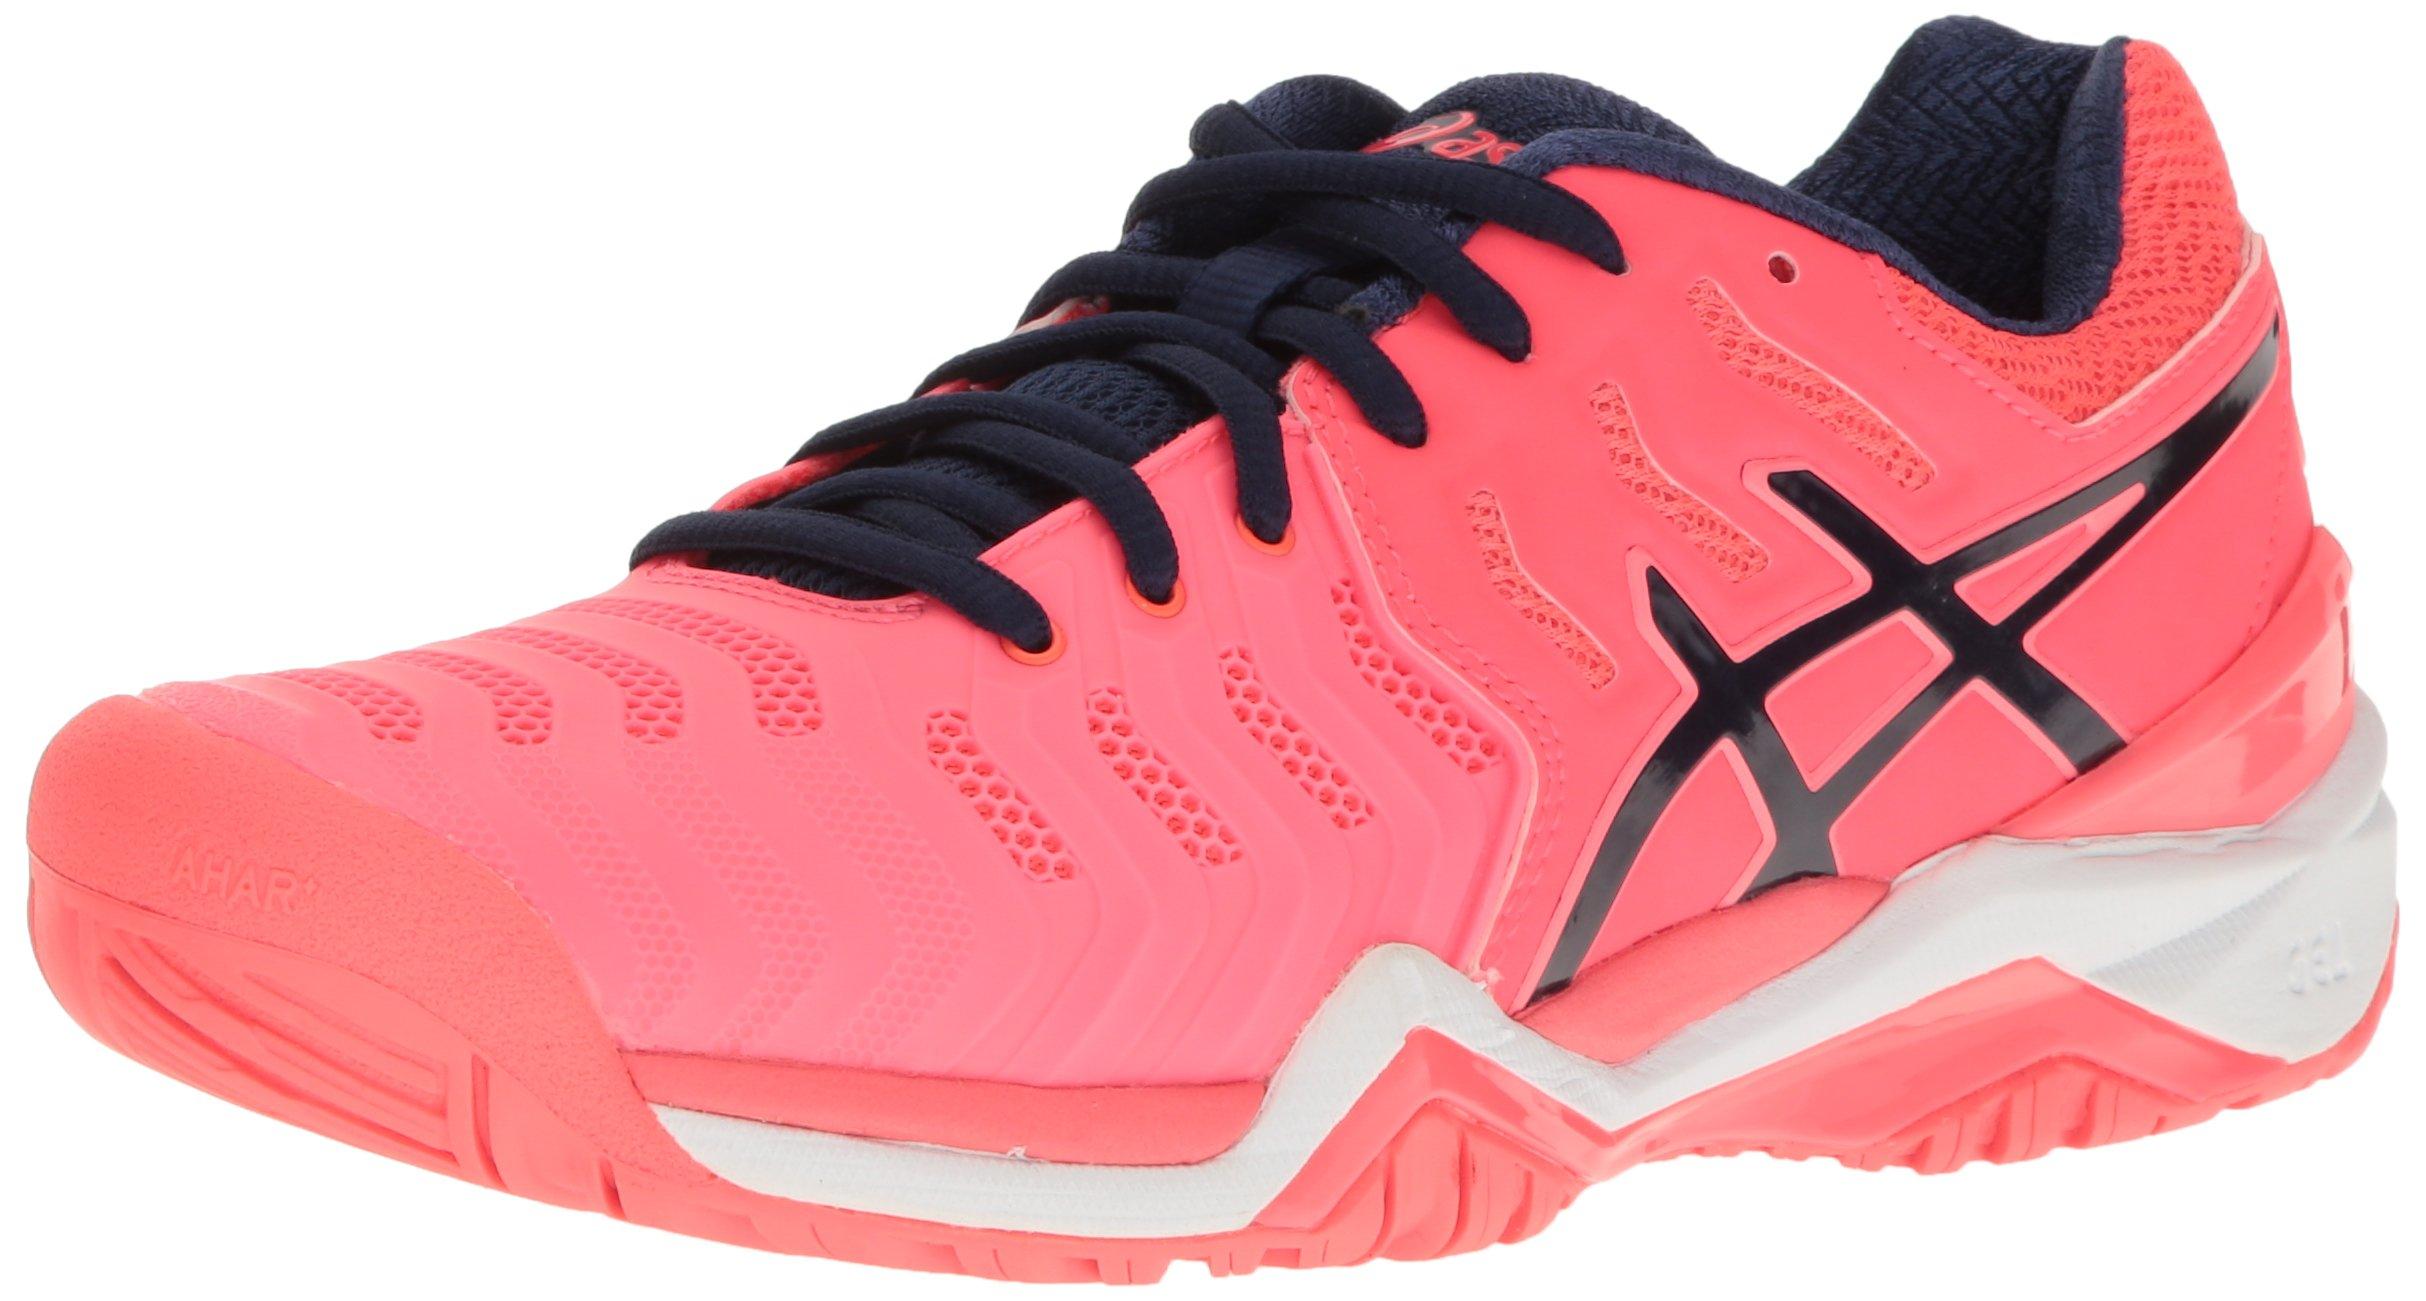 ASICS Women's Gel-Resolution 7 Tennis Shoe, Diva Pink/Indigo Blue/White, 5 M US